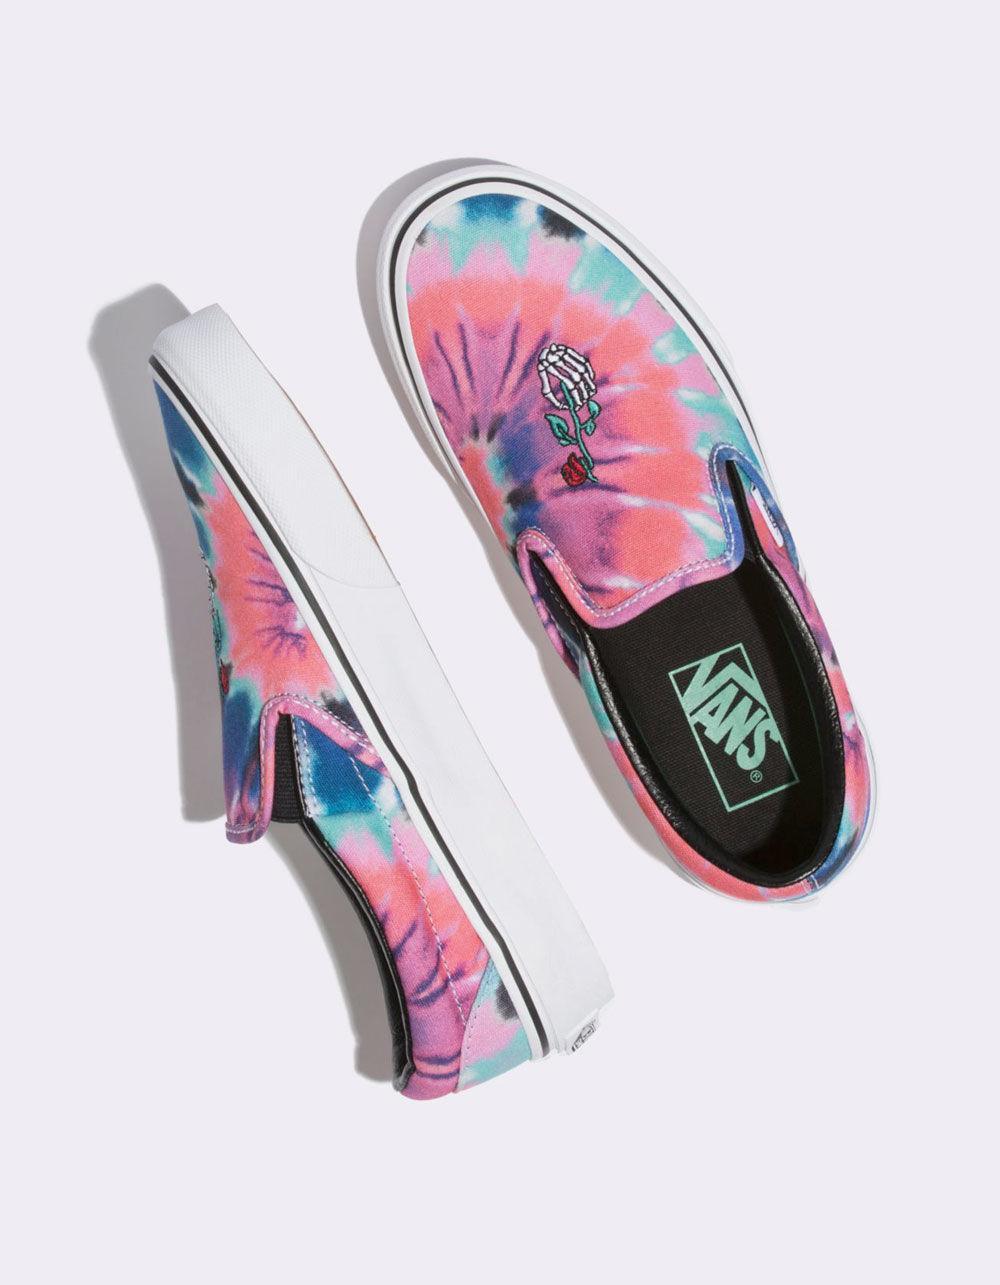 e8641f6c597d Vans - Multicolor Tie Dye Classic Slip-on Womens Shoes - Lyst. View  fullscreen